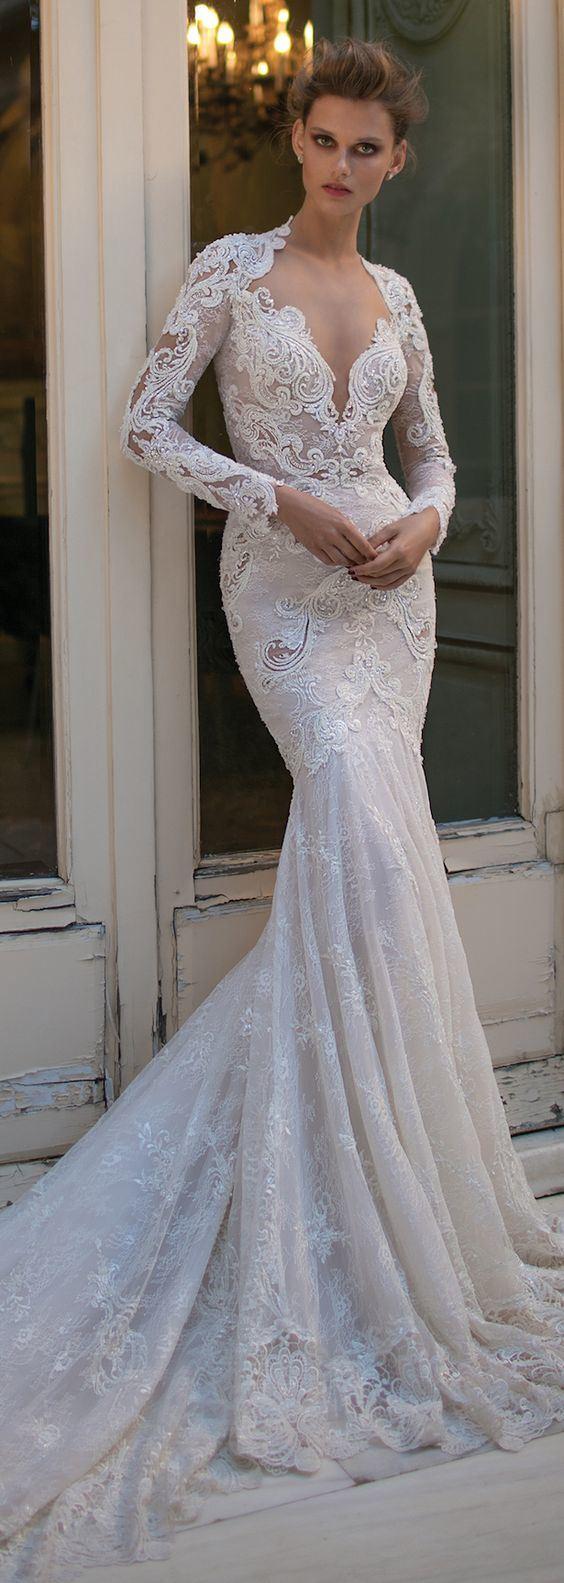 Long Sleeves Berta Bridal Gowns Mermaid Lace Beading Wedding Dress B16302